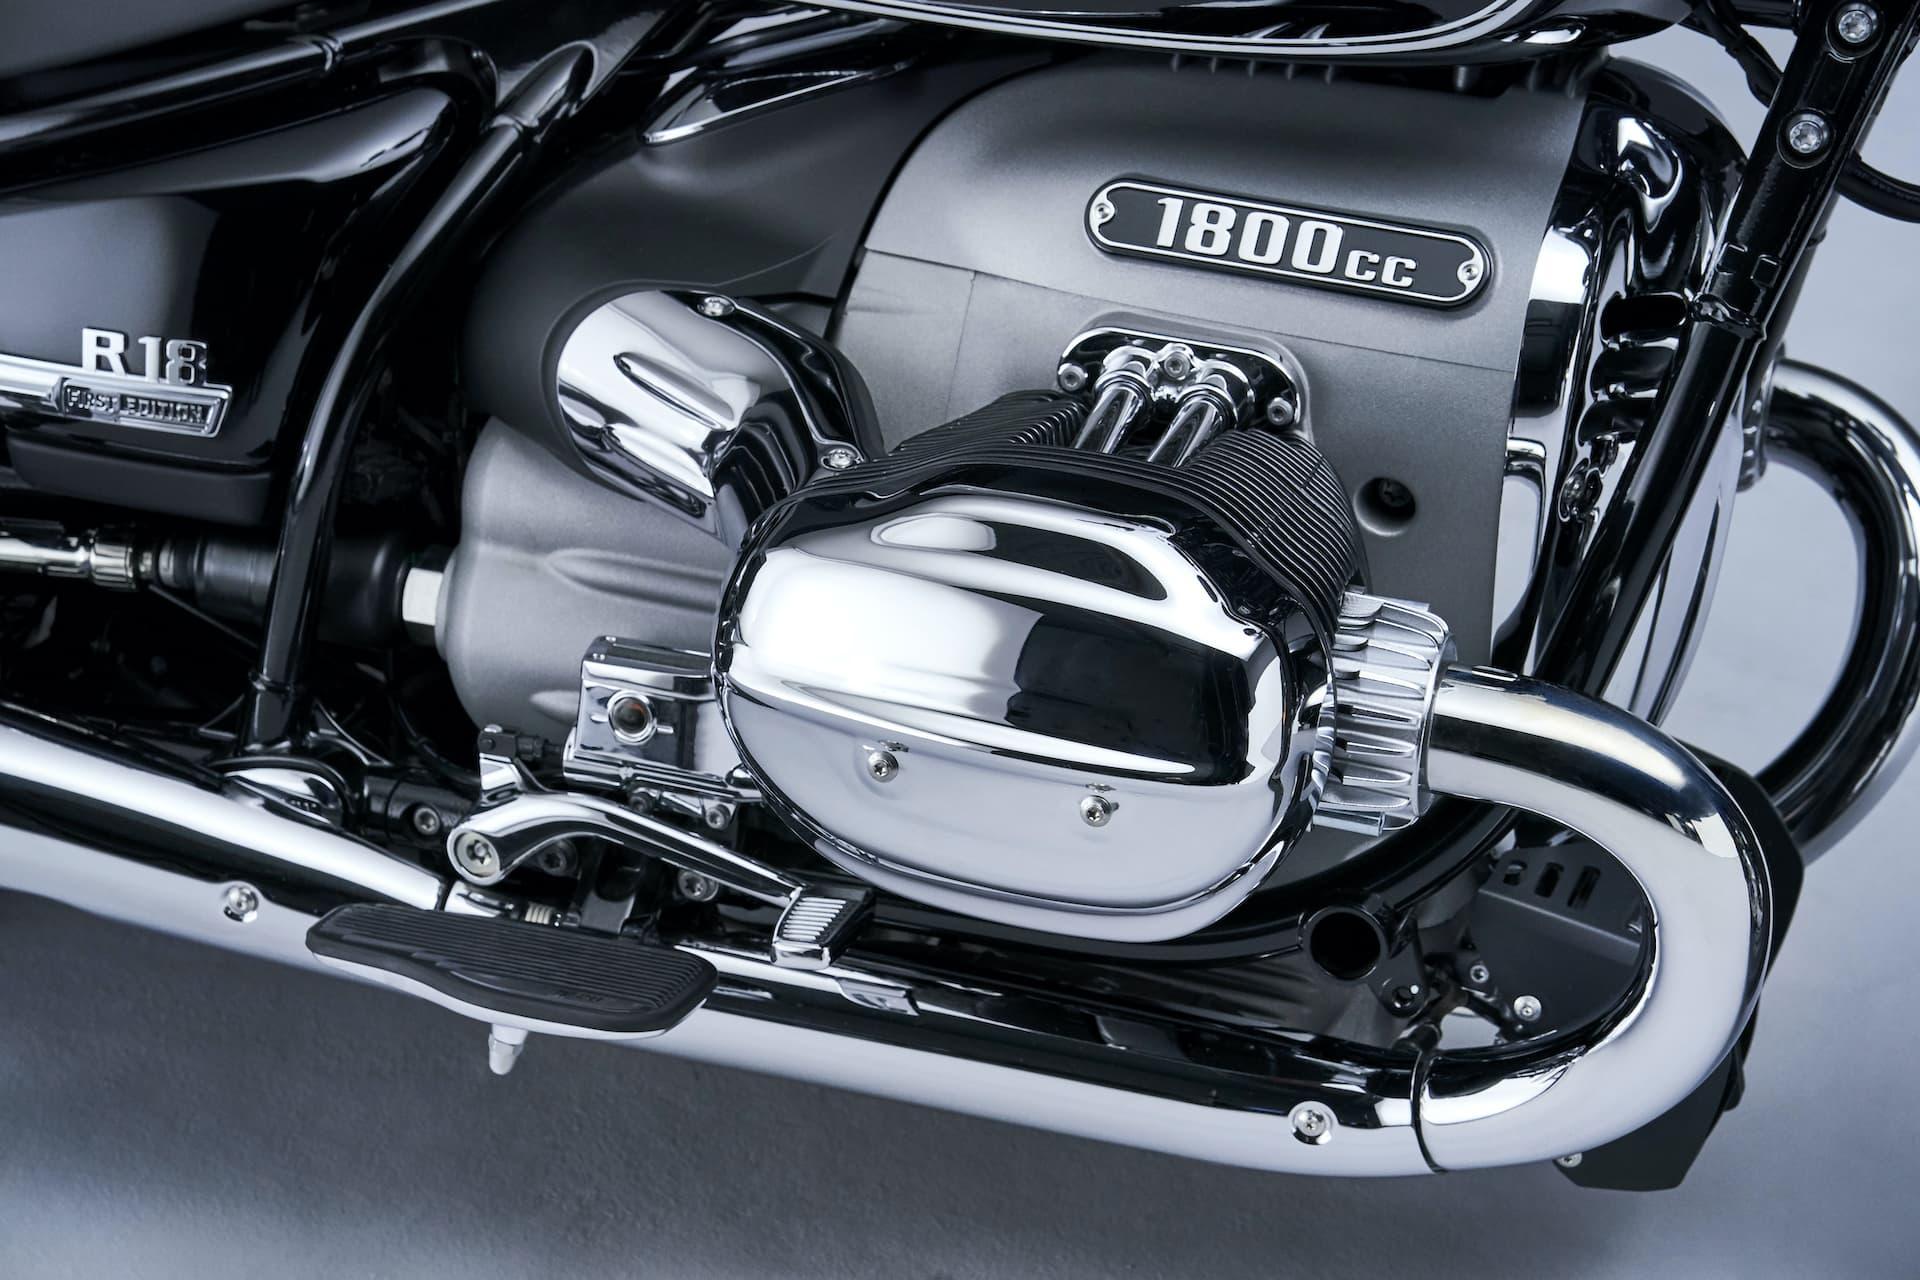 Moto Bmw R18 Classic Boxer